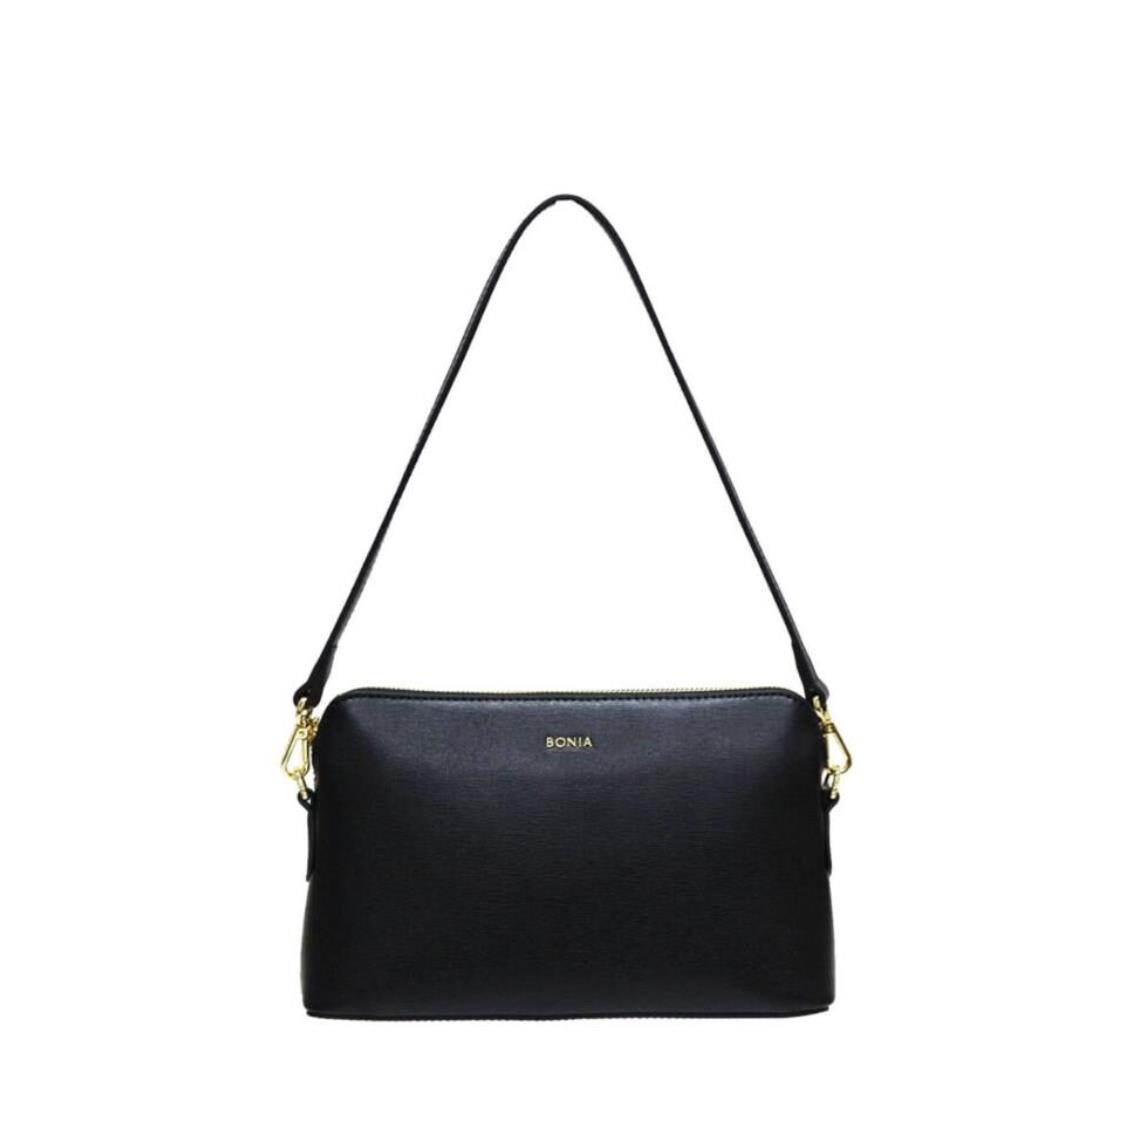 Bonia Charlene Crossbody Bag 801466-001-08